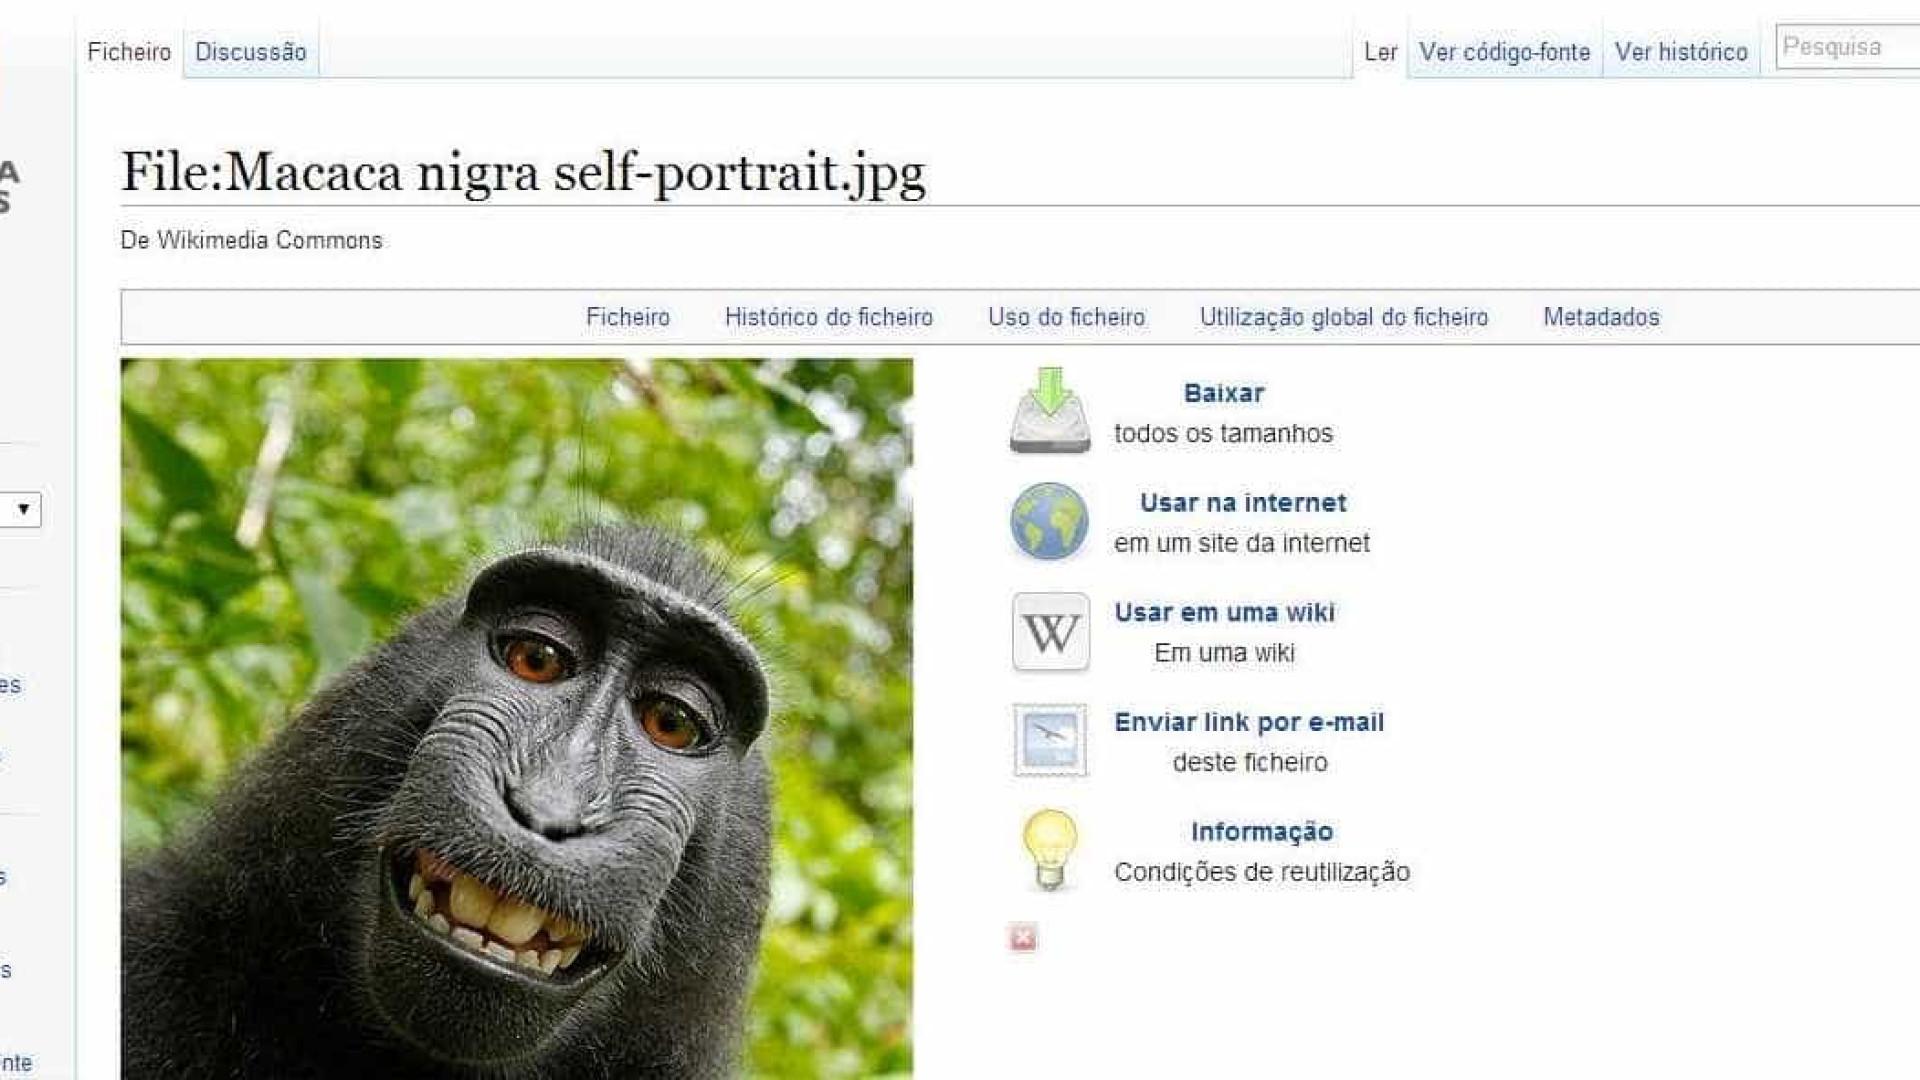 Macaco que tirou selfie vai receber 25% de receitas